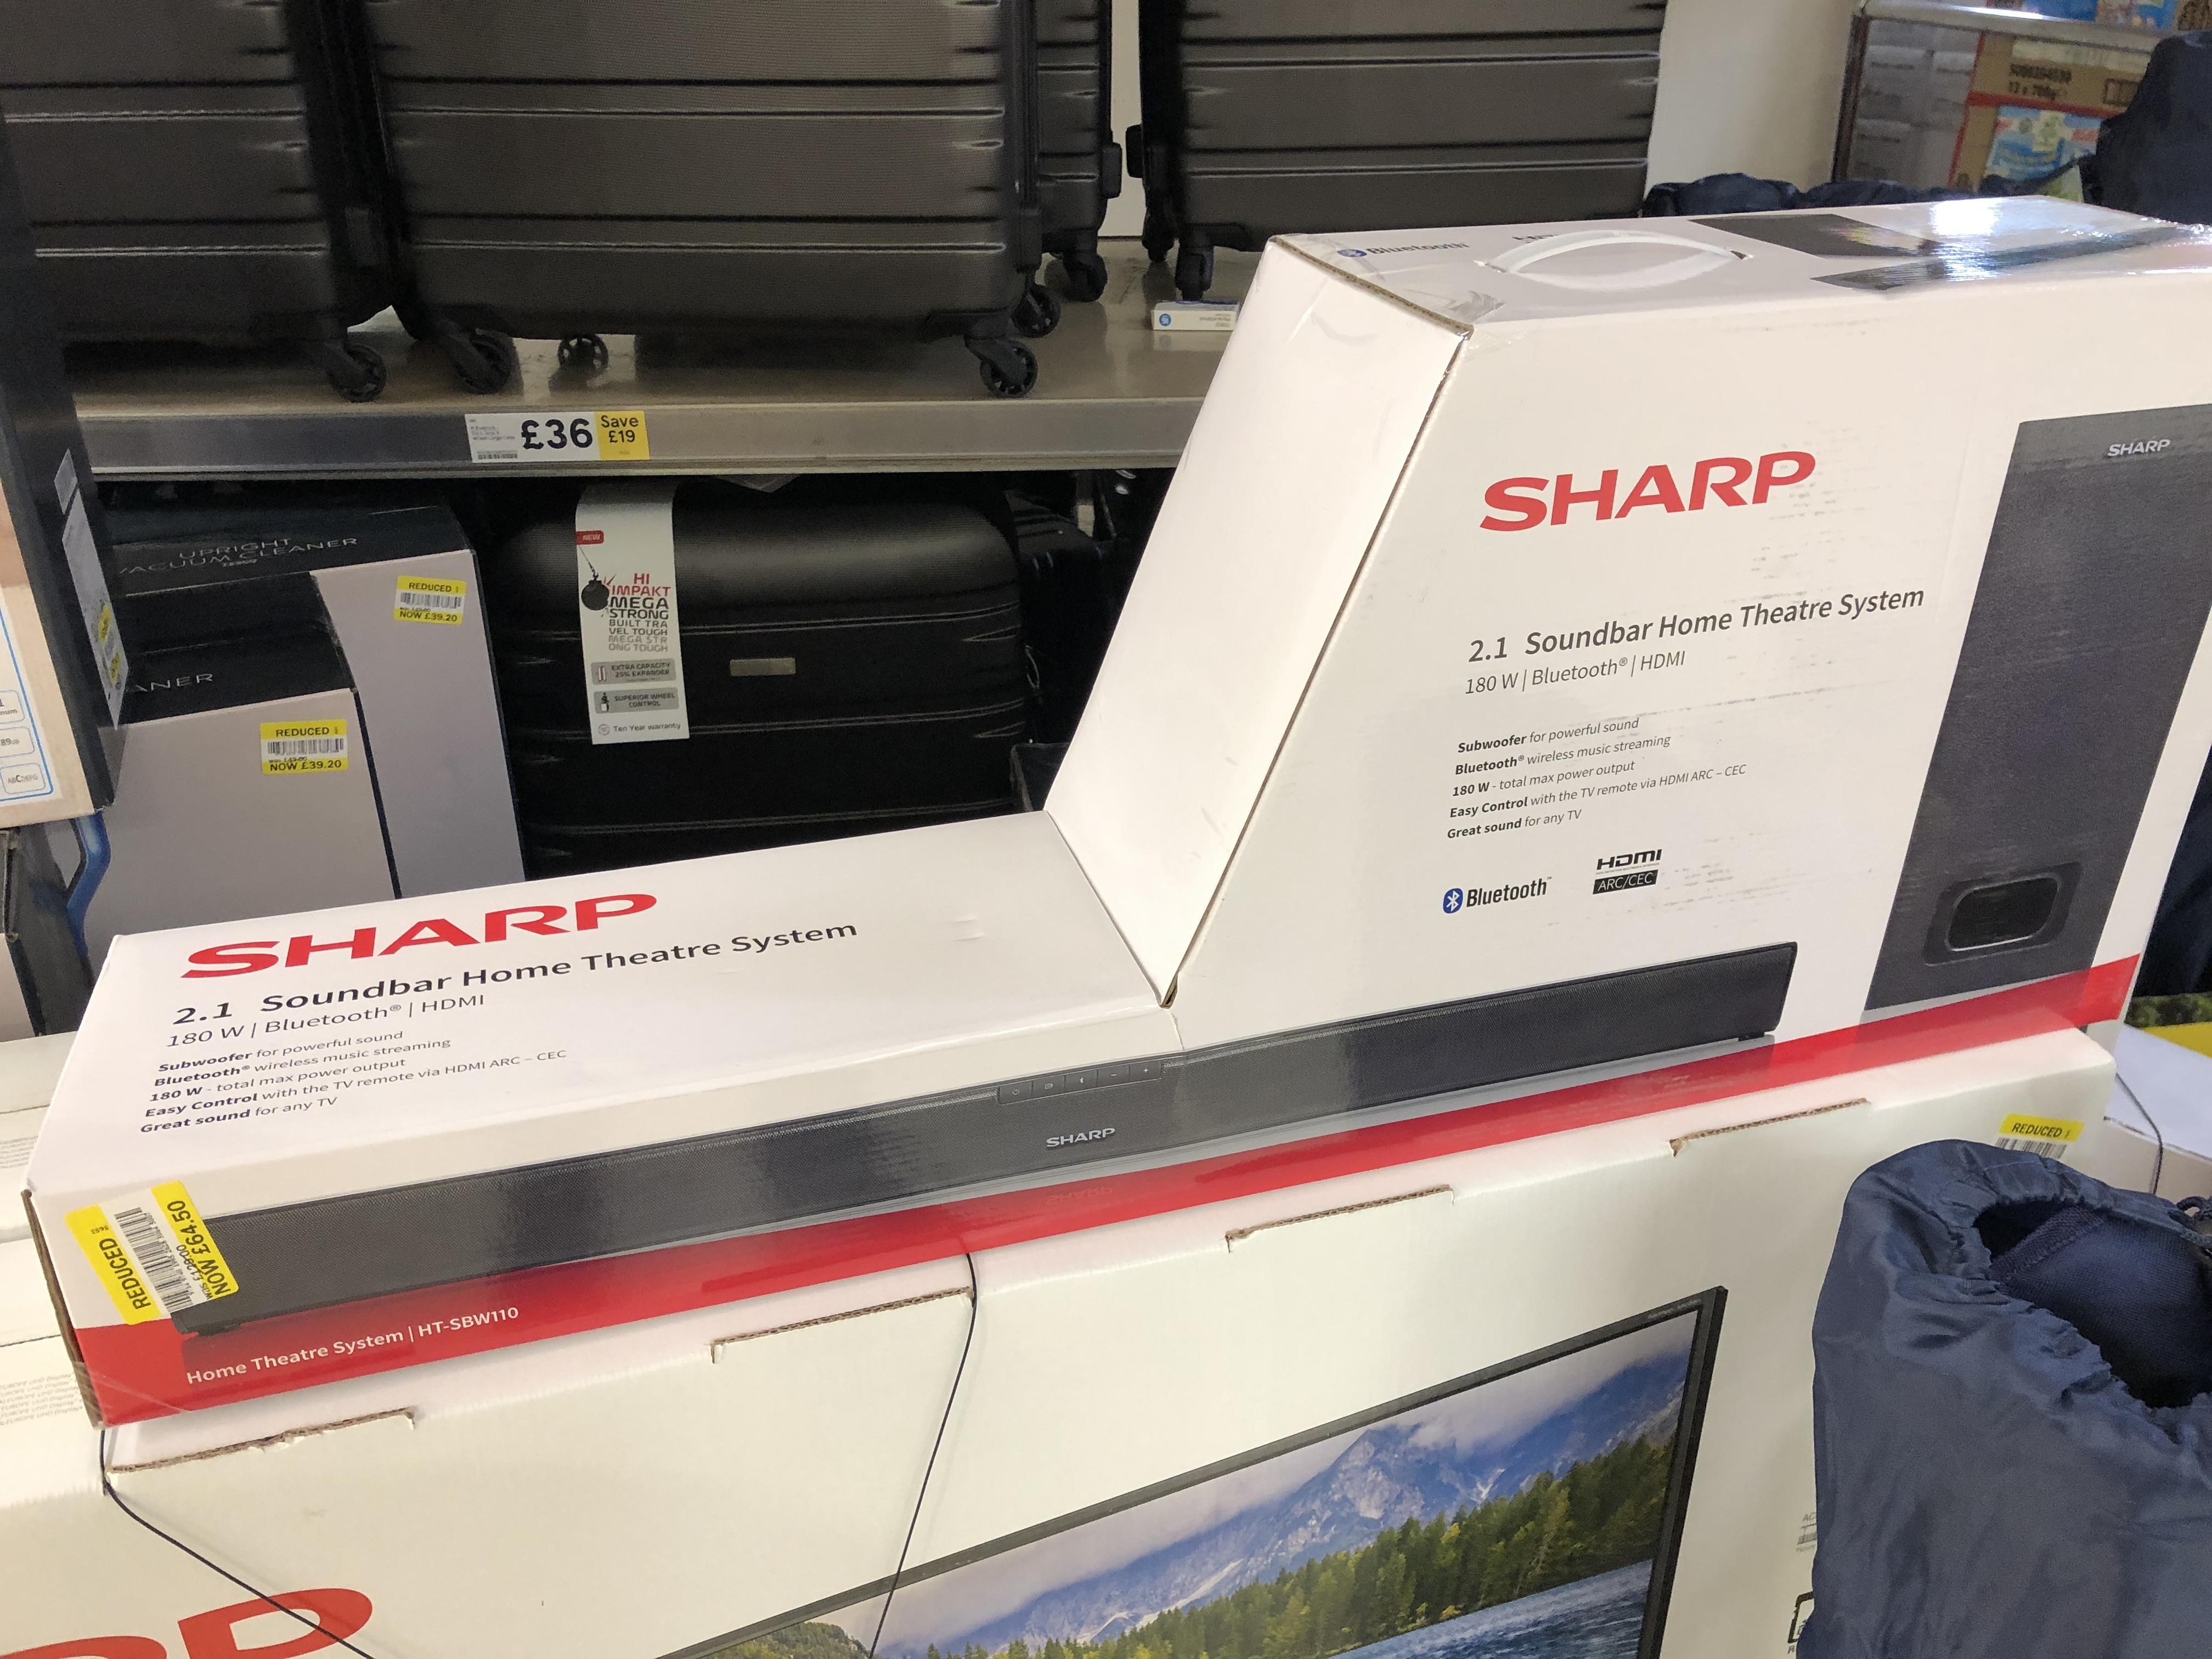 Sharp 2.1 Soundbar HT-SBW110 - £64.50 @ Tesco (Bristol)